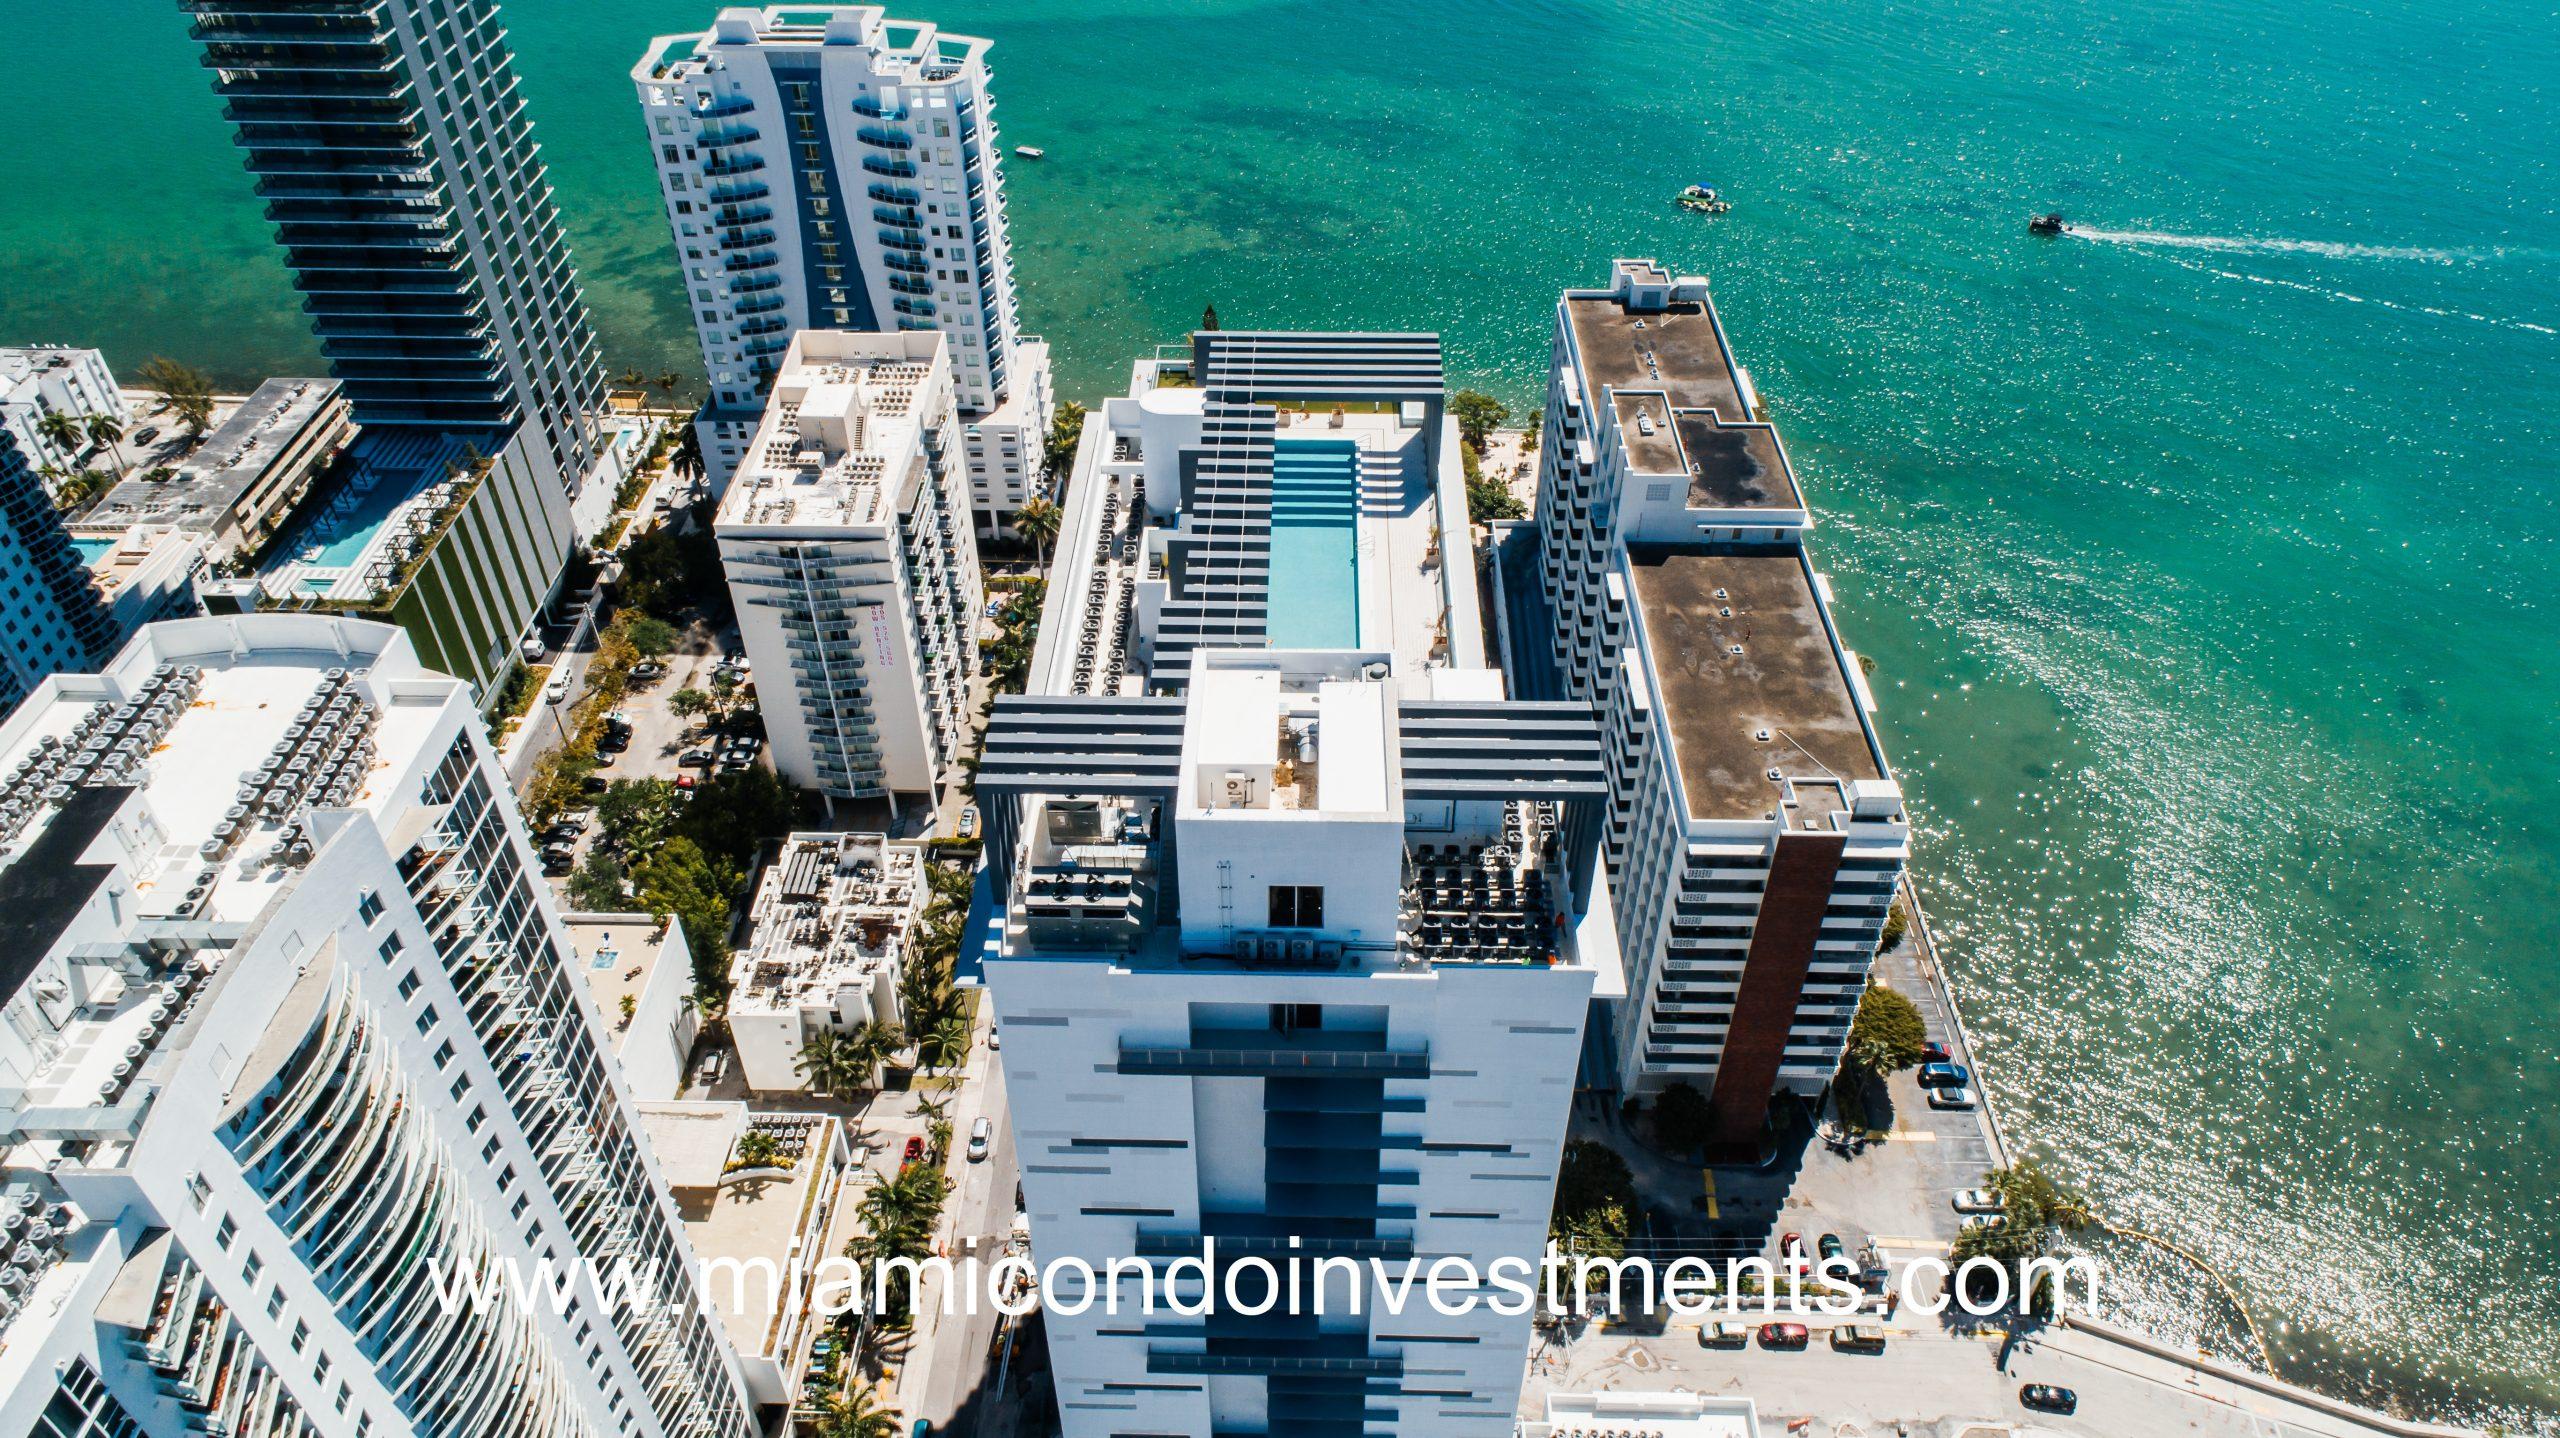 Modera Biscayne Bay Aerial View